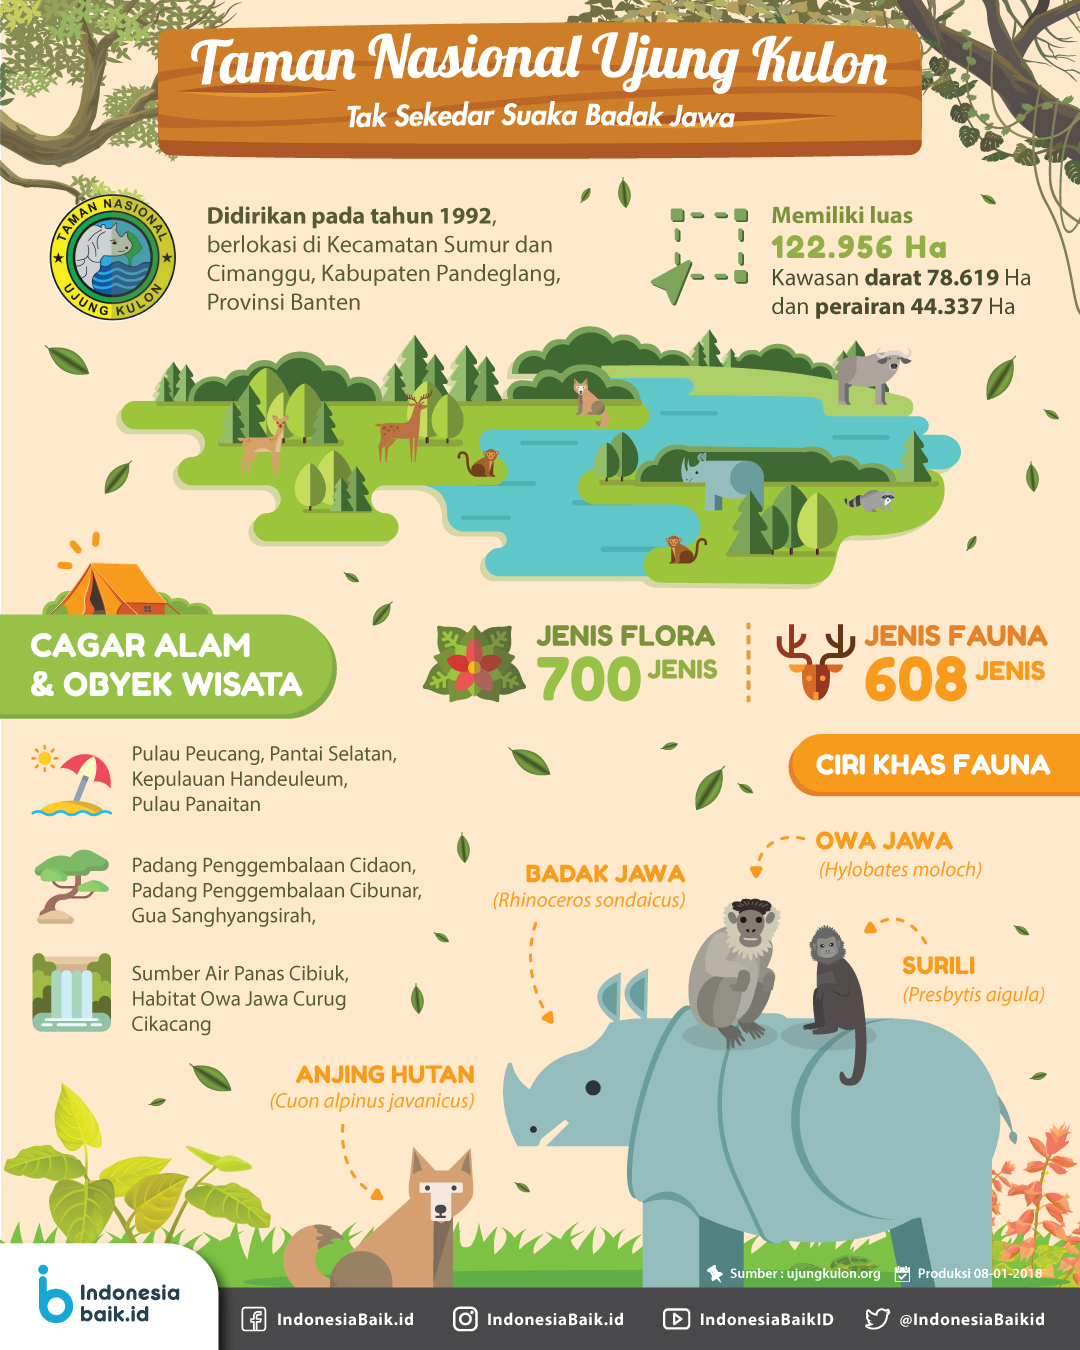 Taman Nasional Ujung Kulon Tak Sekedar Suaka Badak Jawa Indonesia